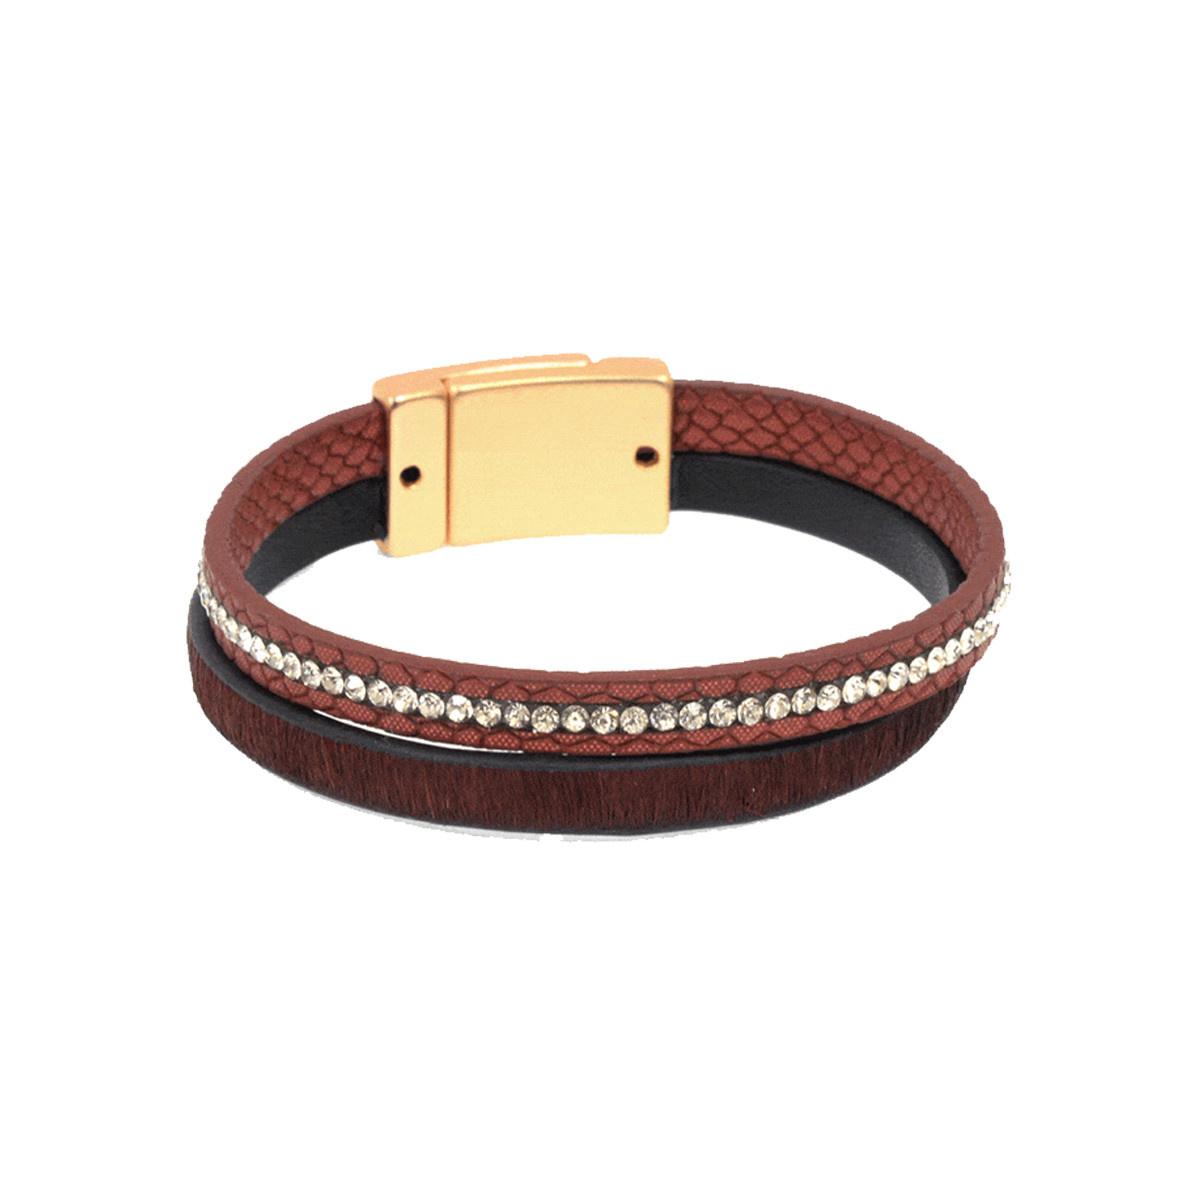 Joy Susan Joy Susan Leather & Pony Burgundy Bracelet